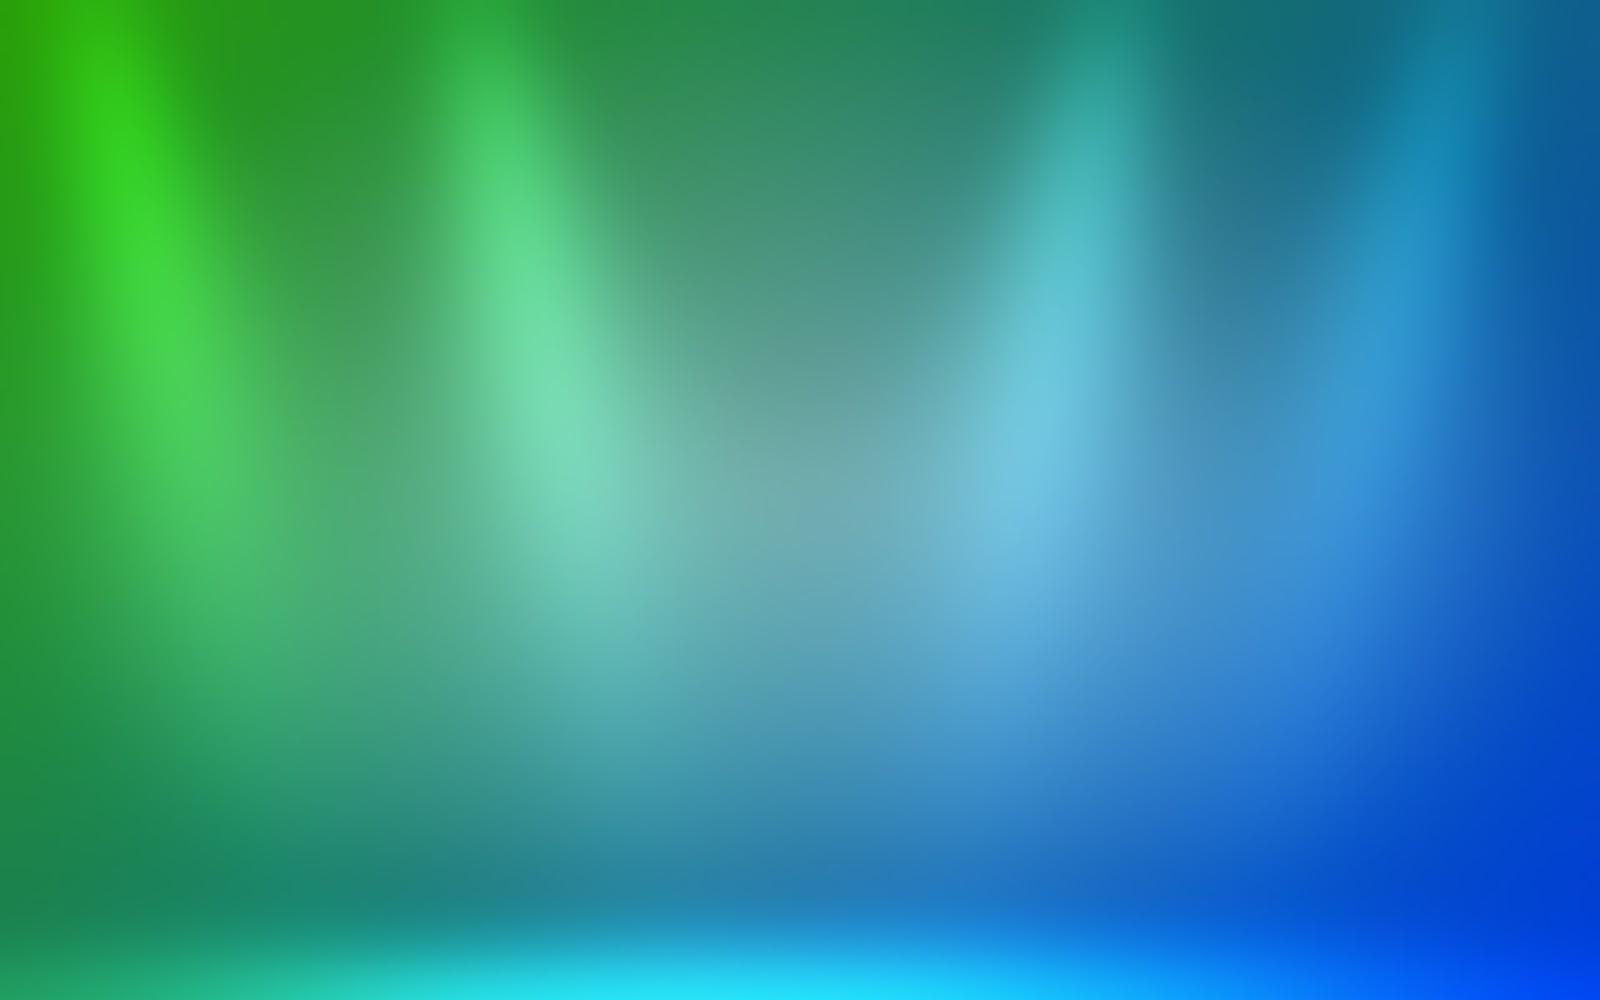 and green wallpaper blue and green wallpaper blue and green wallpaper 1600x1000